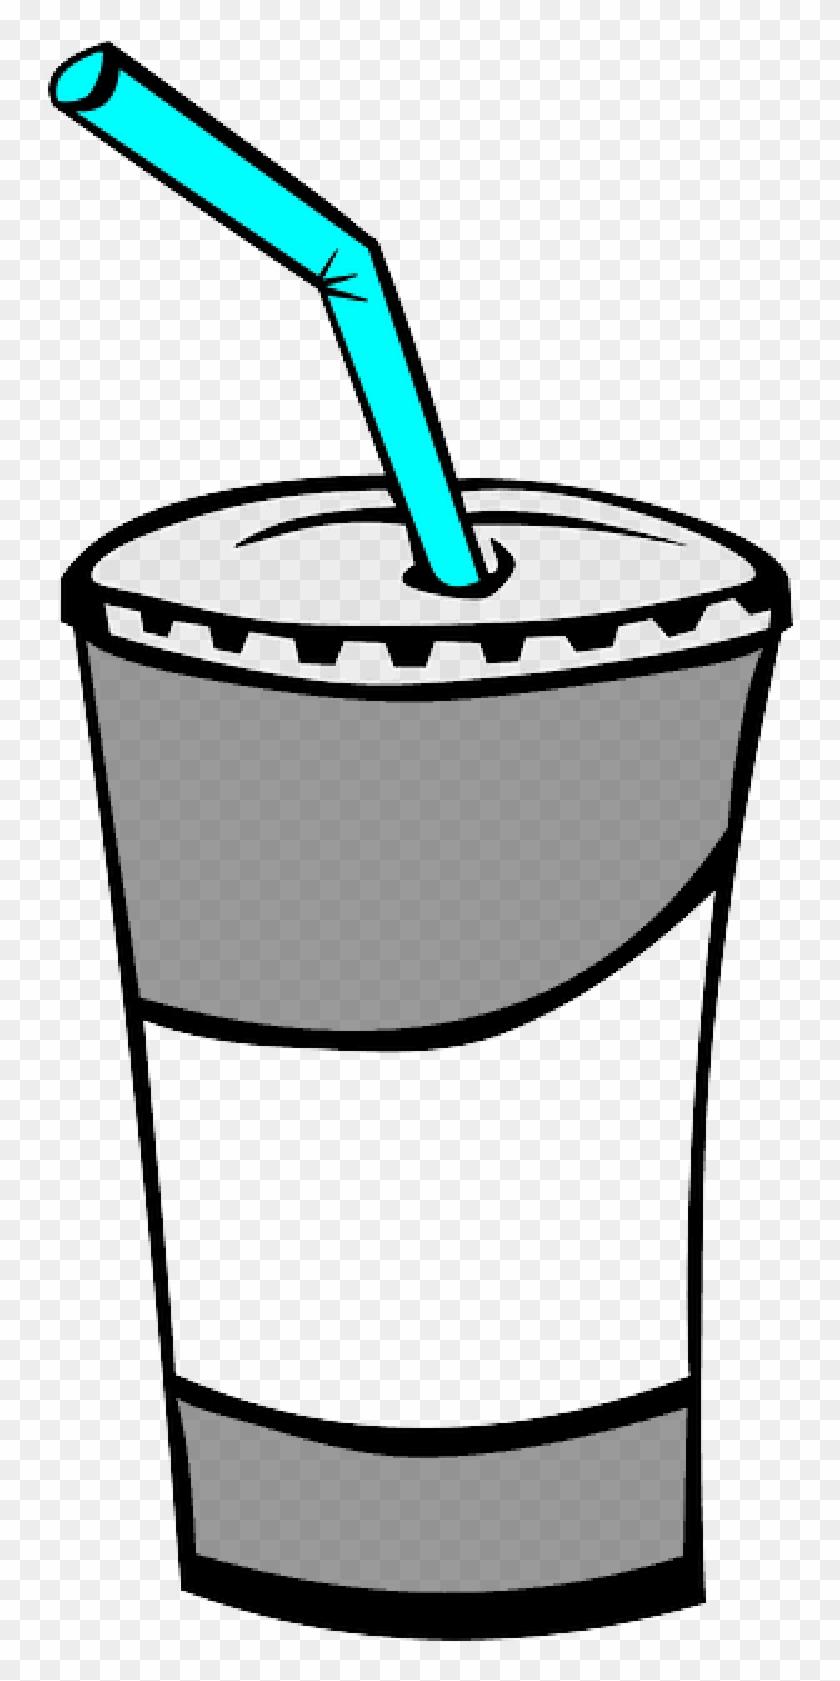 Icon, Glass, Food, Menu, Juice, Cup, Bottle, Cartoon - Soda Clipart #899737